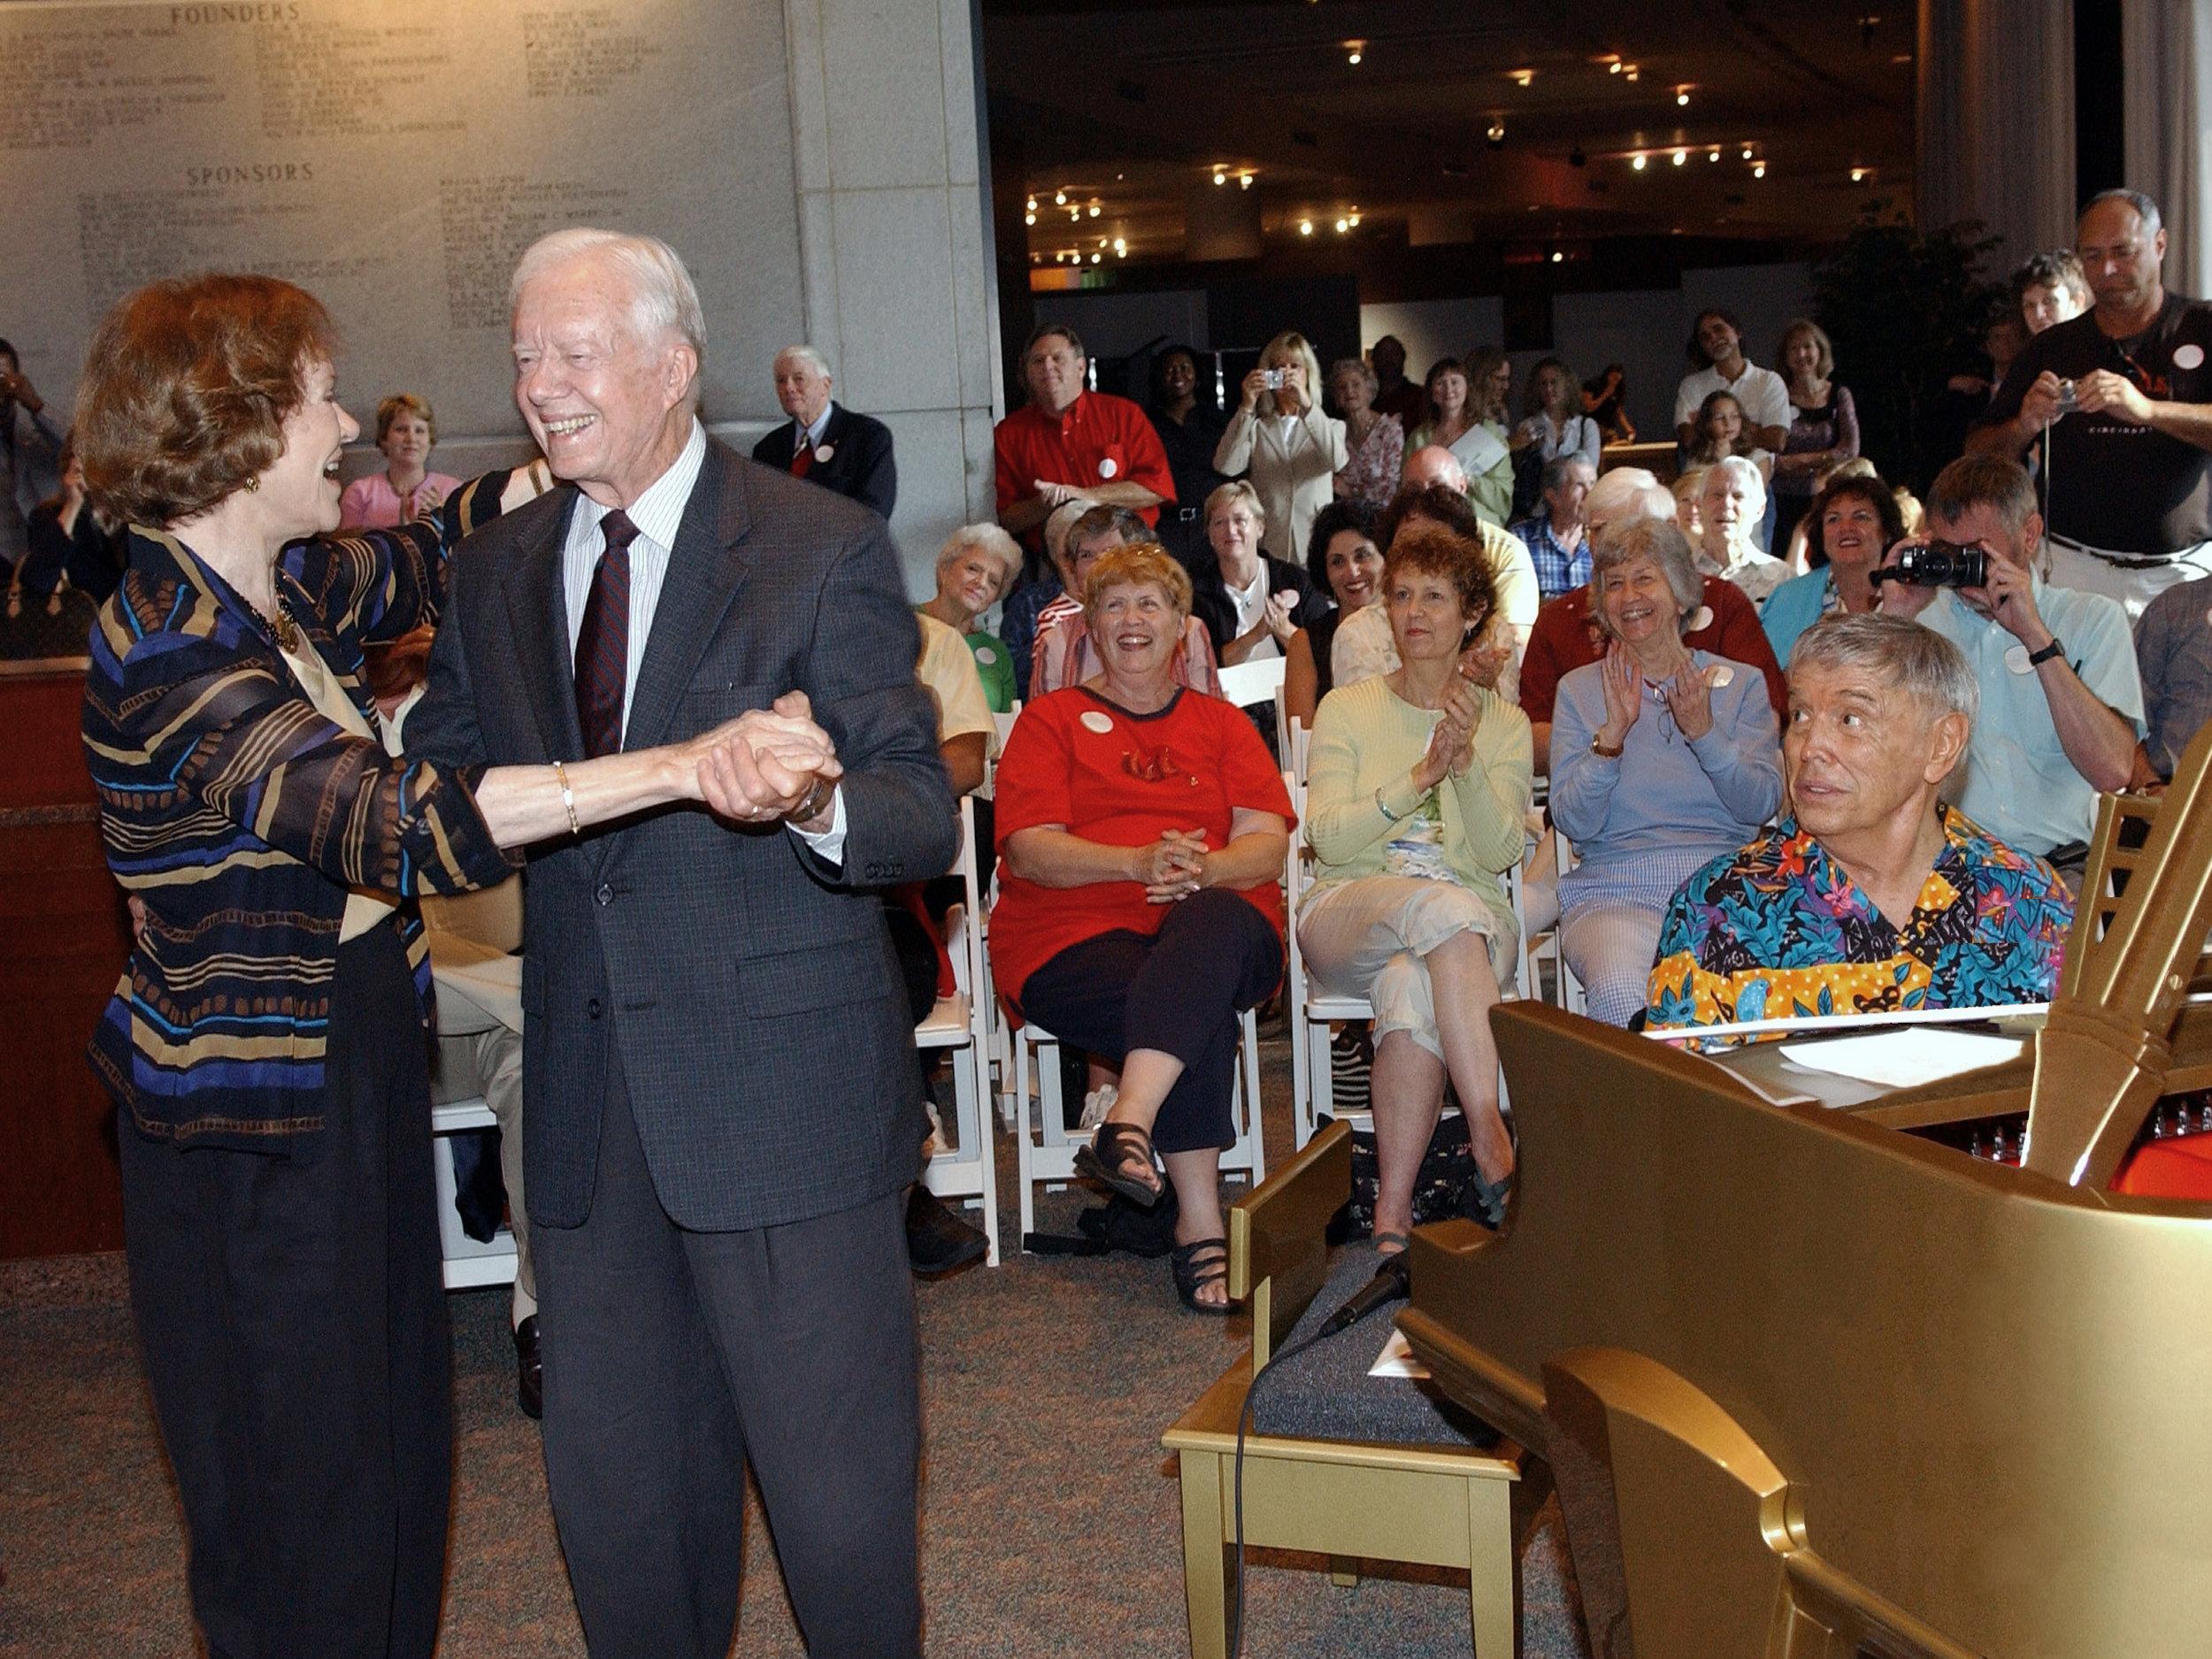 President Jimmy Carter and Rosalynn dancing